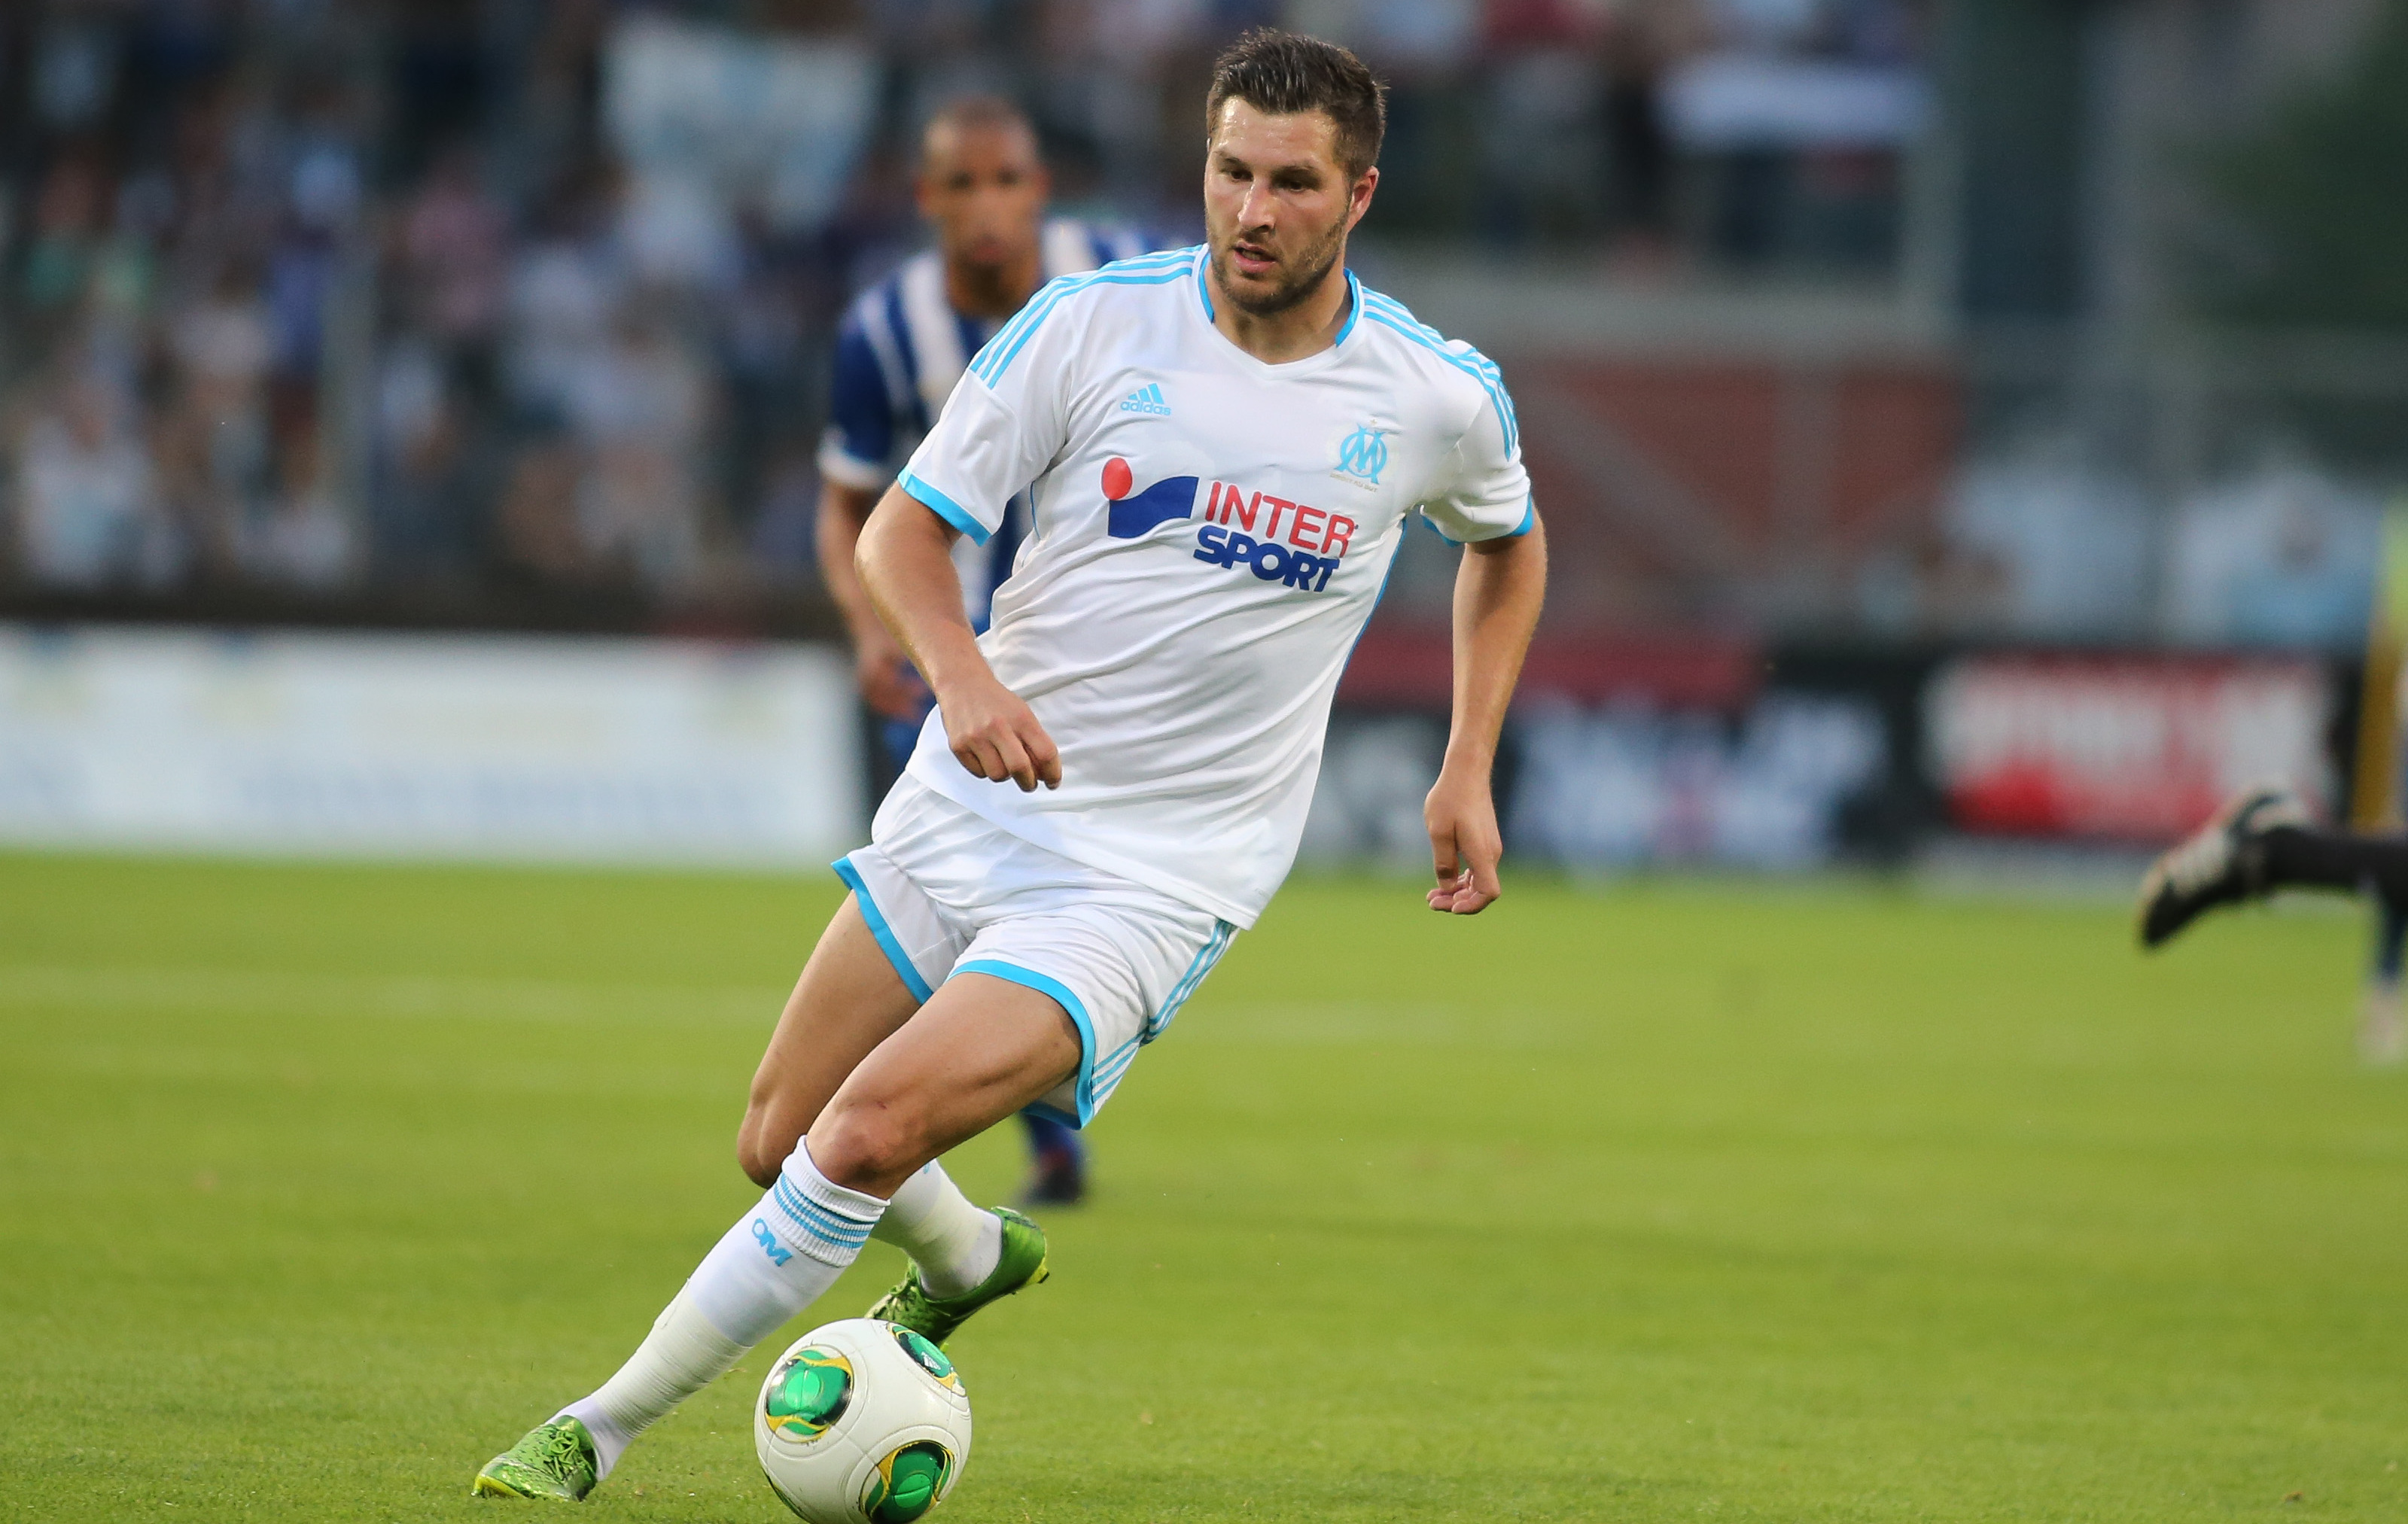 Gignac pouss vers la sortie transferts football for Interieur sport gignac